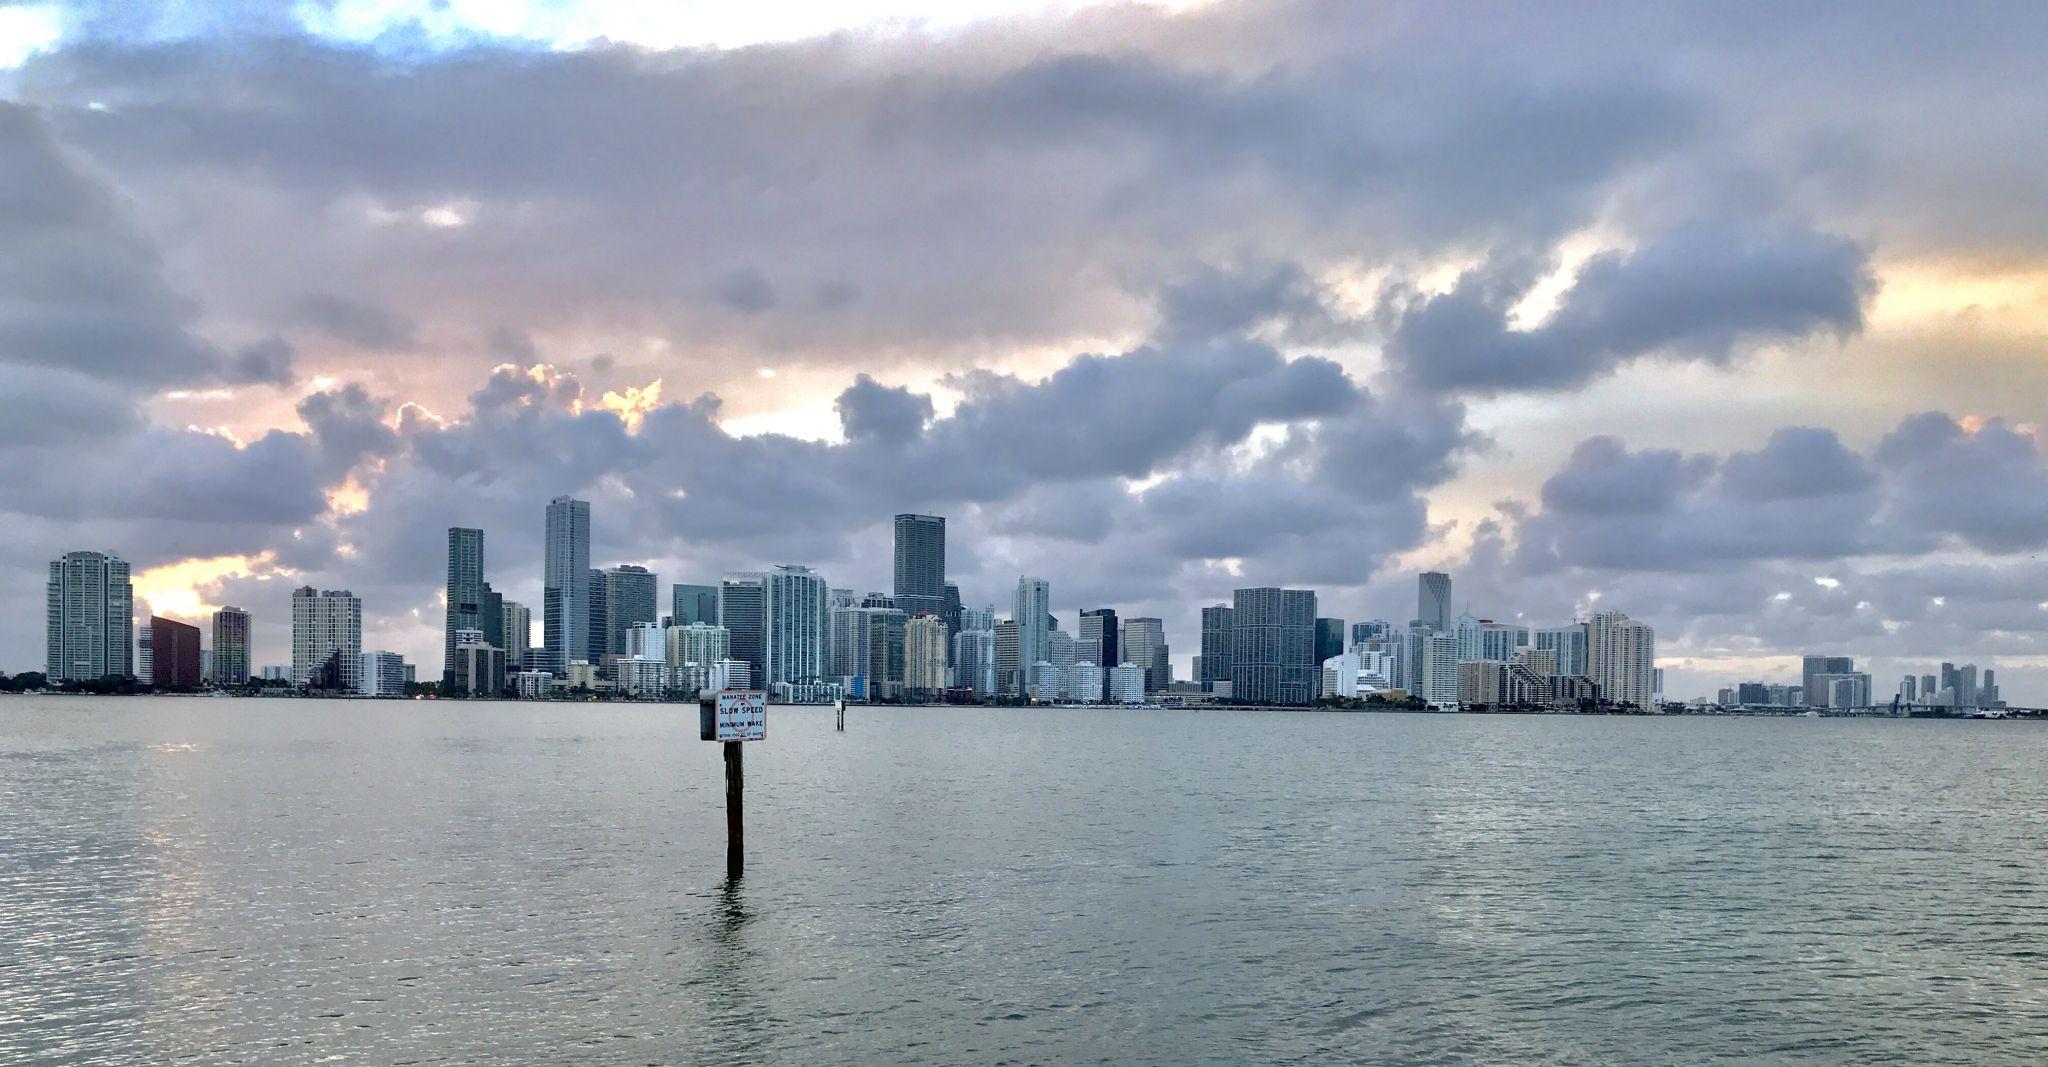 Miami Skyline Sunset, USA